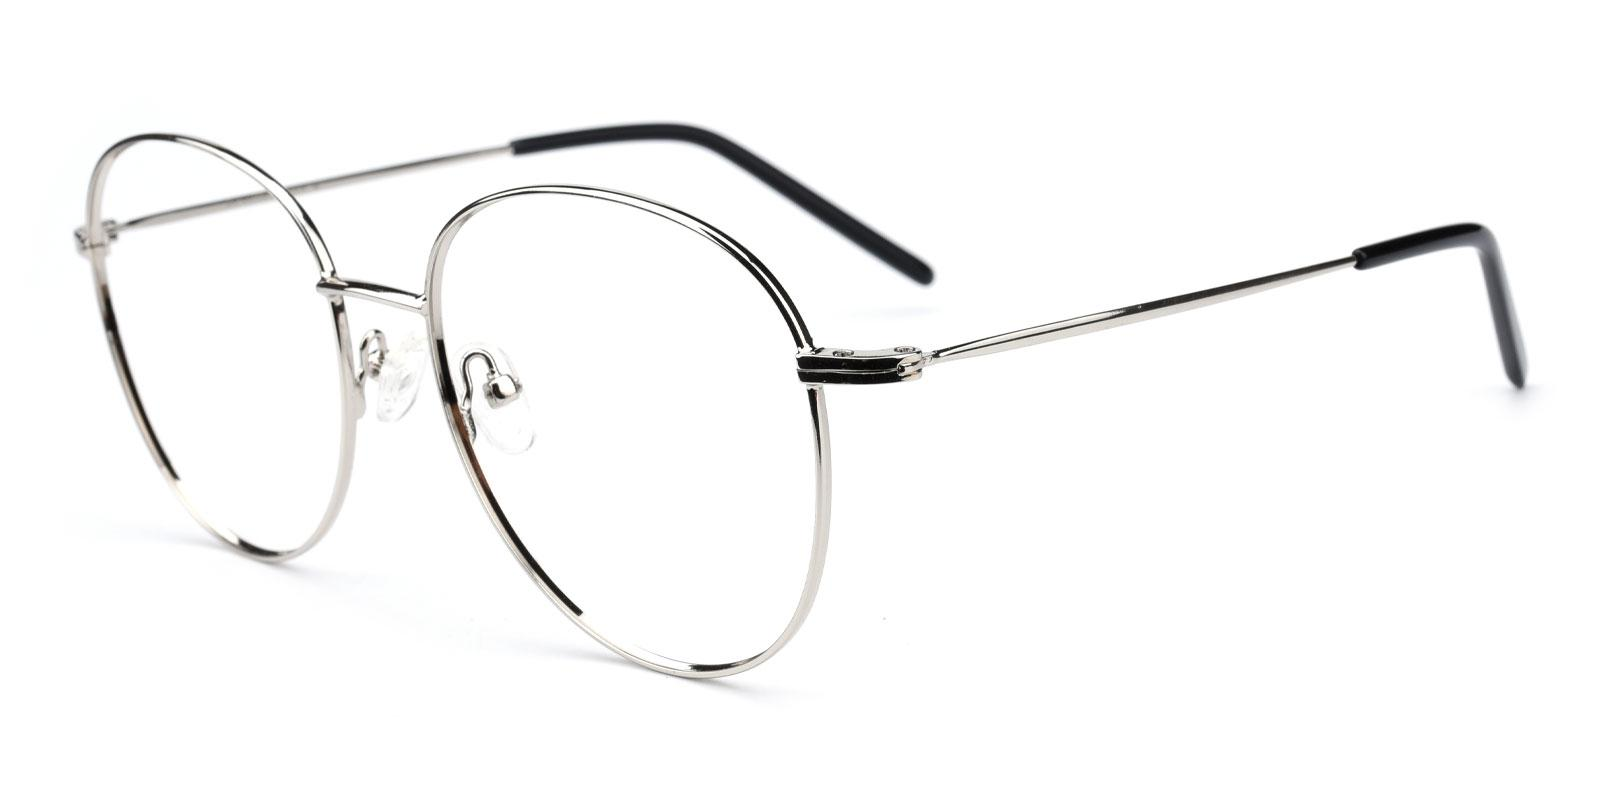 Damla-Silver-Round-Metal-Eyeglasses-additional1